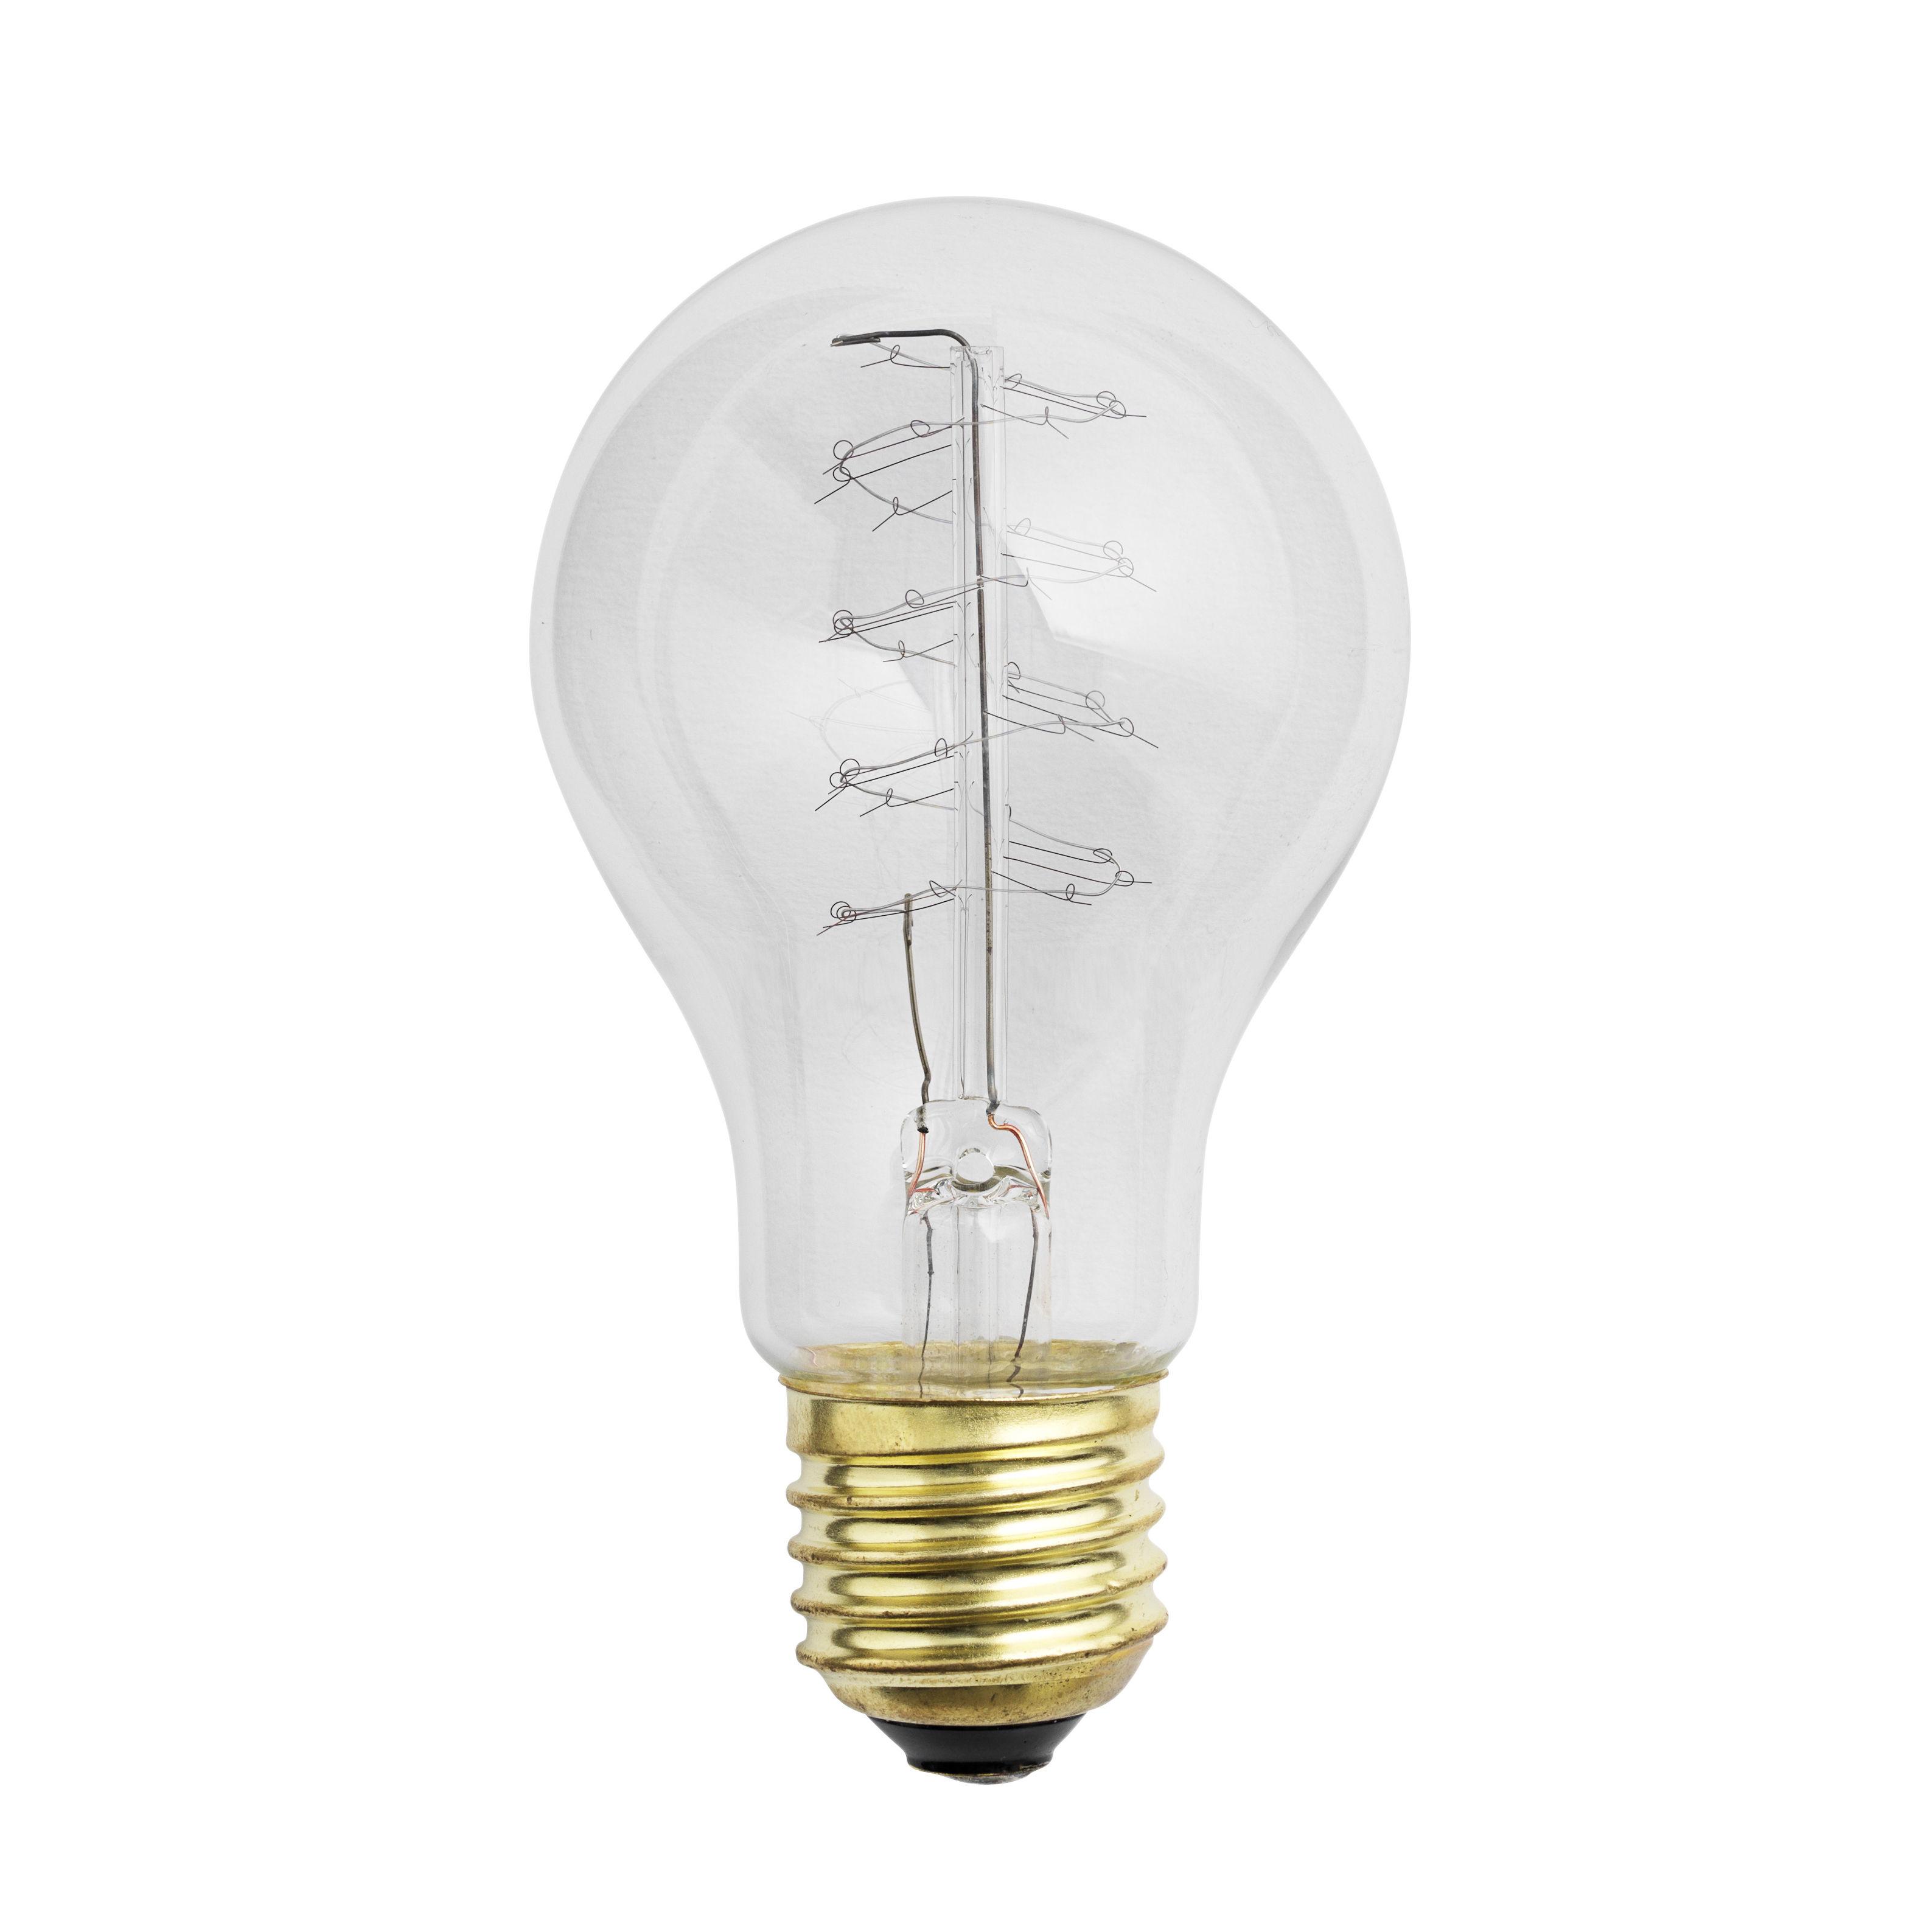 ampoule incandescente e27 40w pour lampe de table cosy in grey transparent muuto. Black Bedroom Furniture Sets. Home Design Ideas